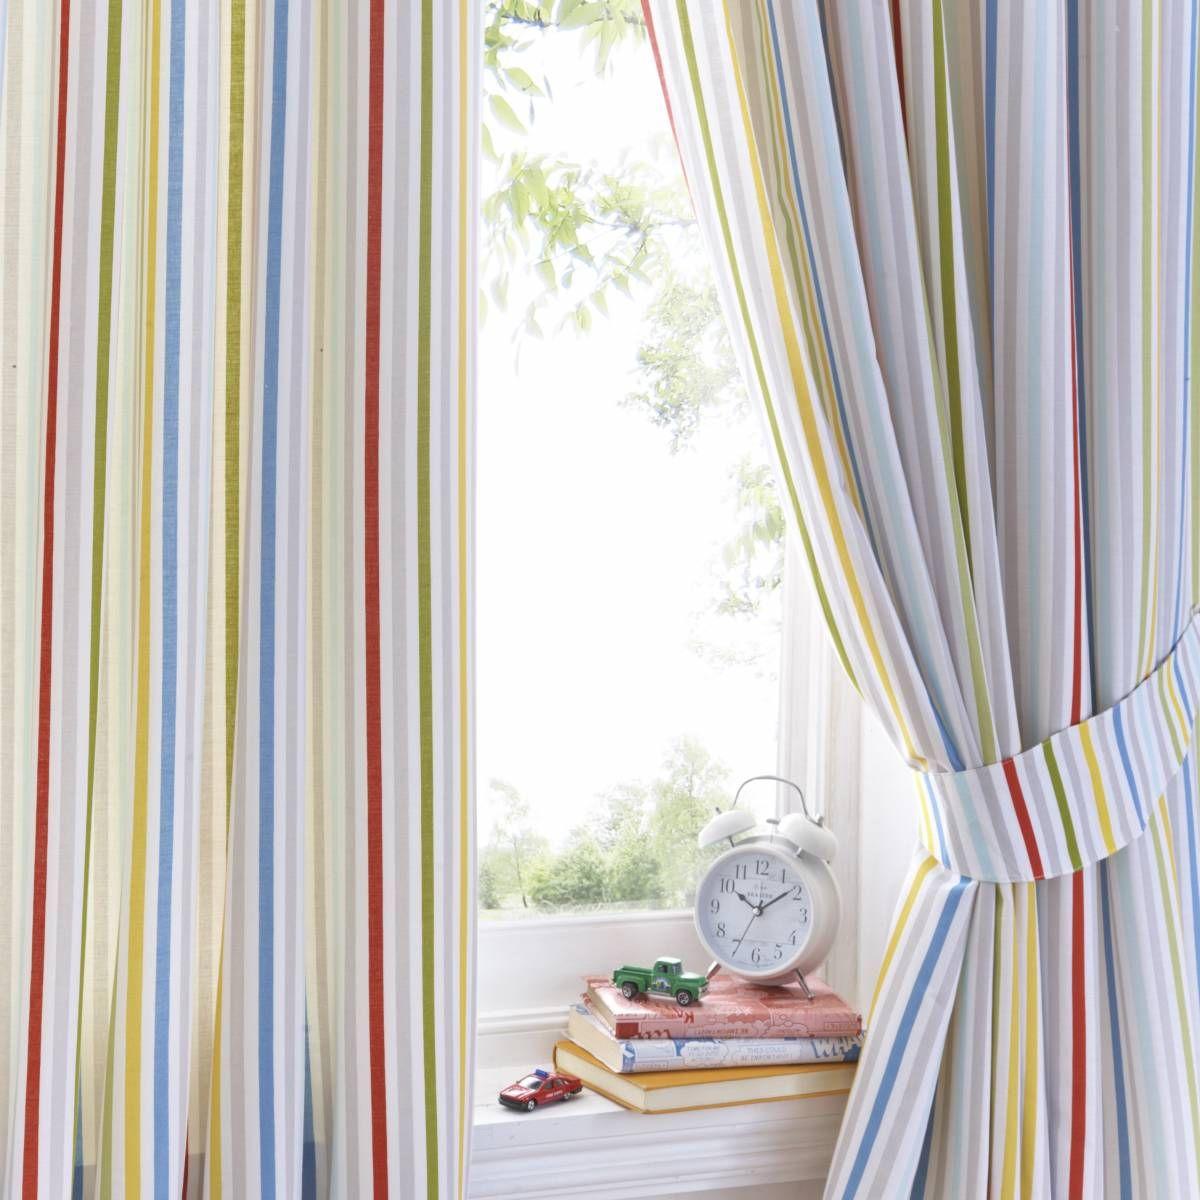 16 Remarkable Childrens Bedroom Curtains Digital Image Idea ...